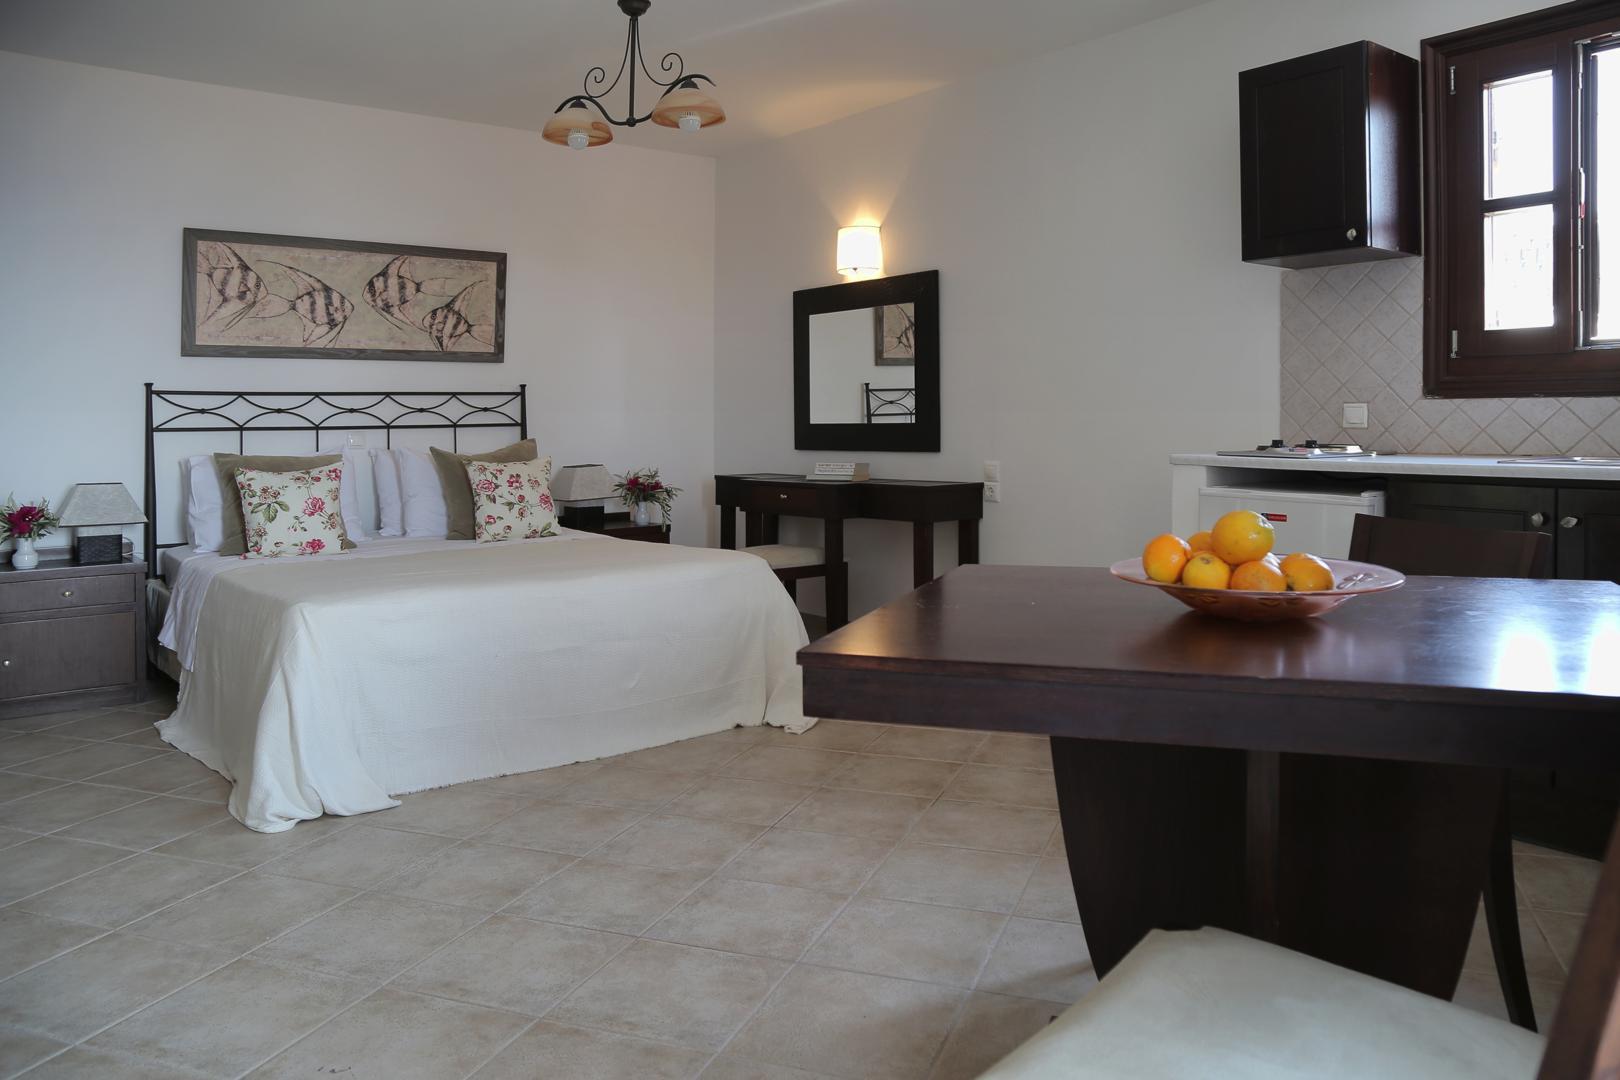 Yalis Hotel - Classic Room 1